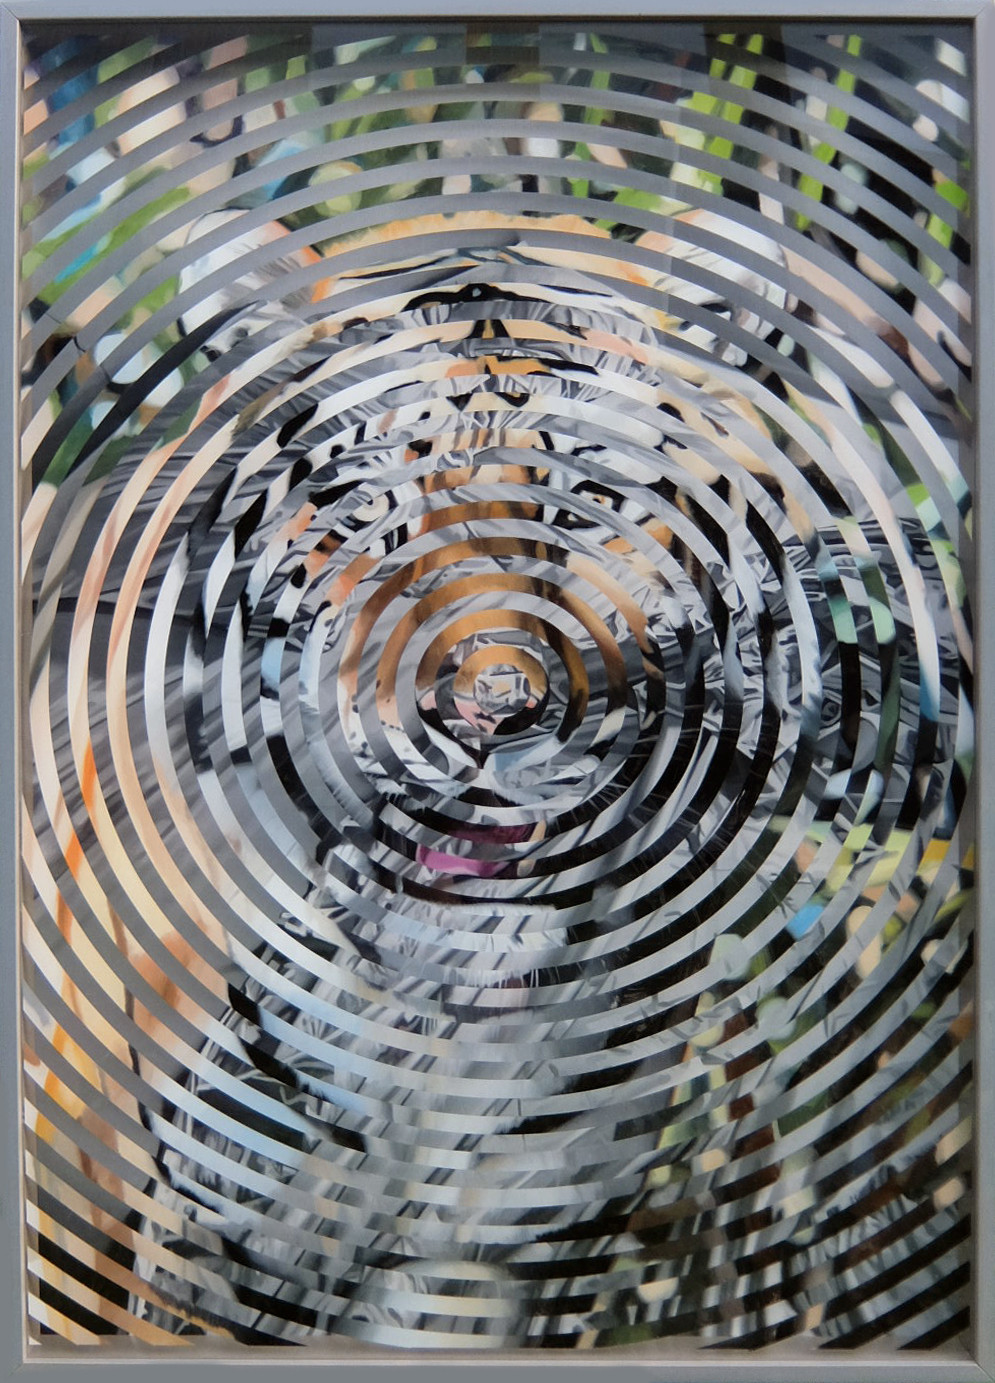 "Maarit Murka  ,,Gyvuliškas instinktas"" (detalė). 2020, aliejus, drobė, mišri technika, 140x110 cm."